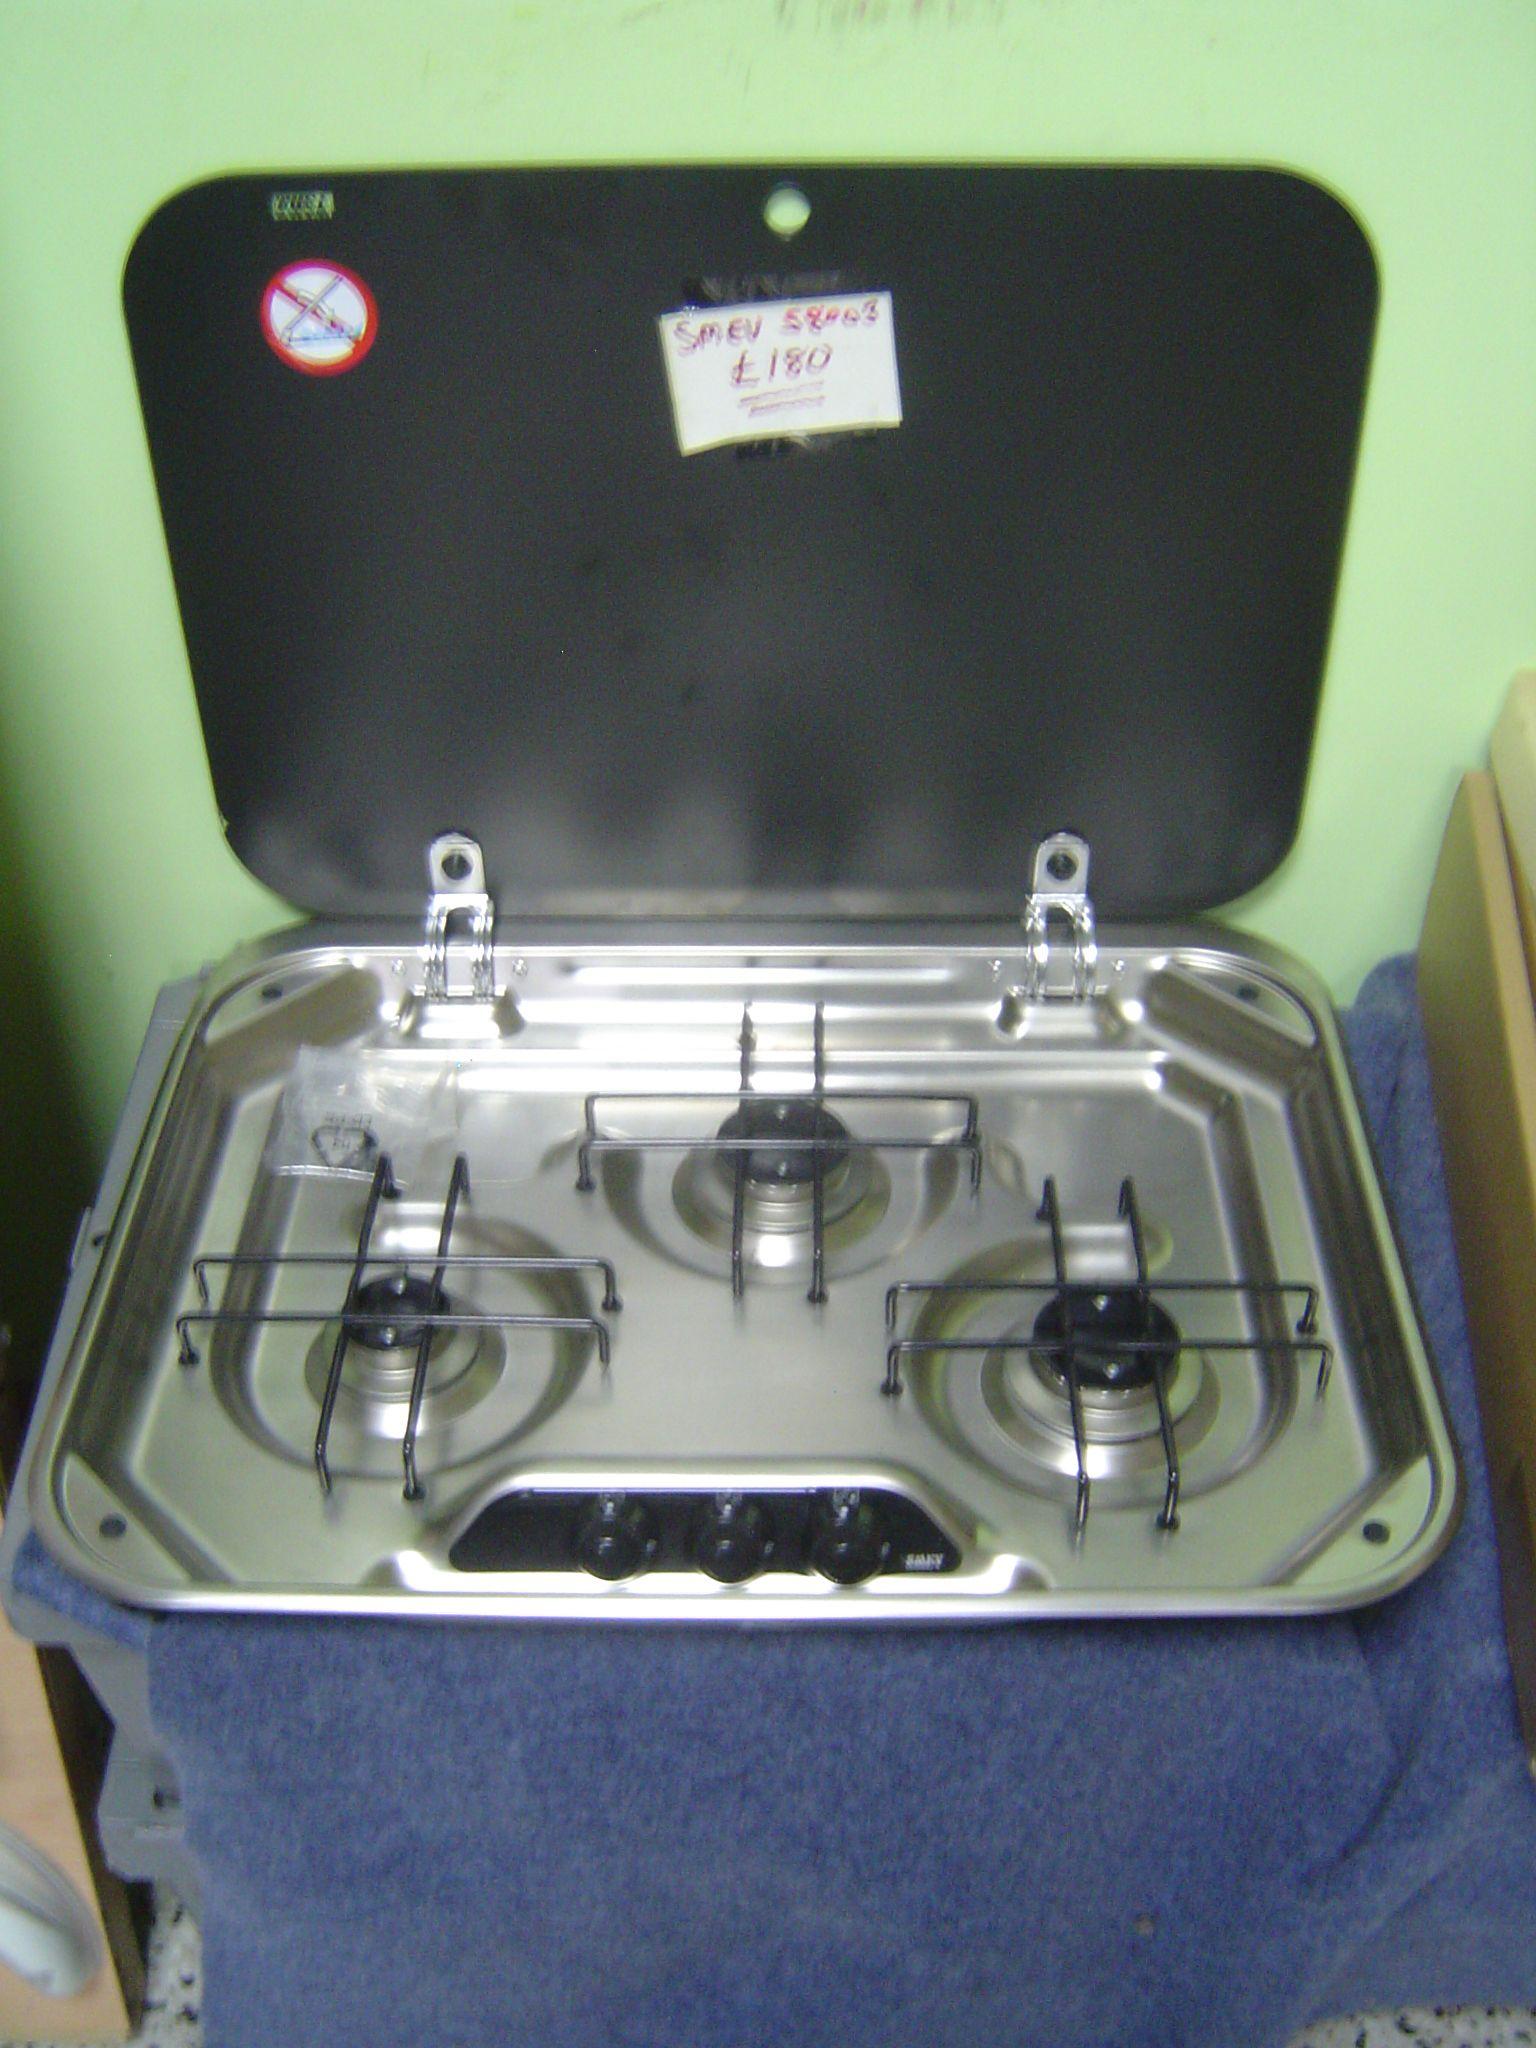 Eb302 8003 Smev 3 Brn Gas Hob Amp Black Glass Cover